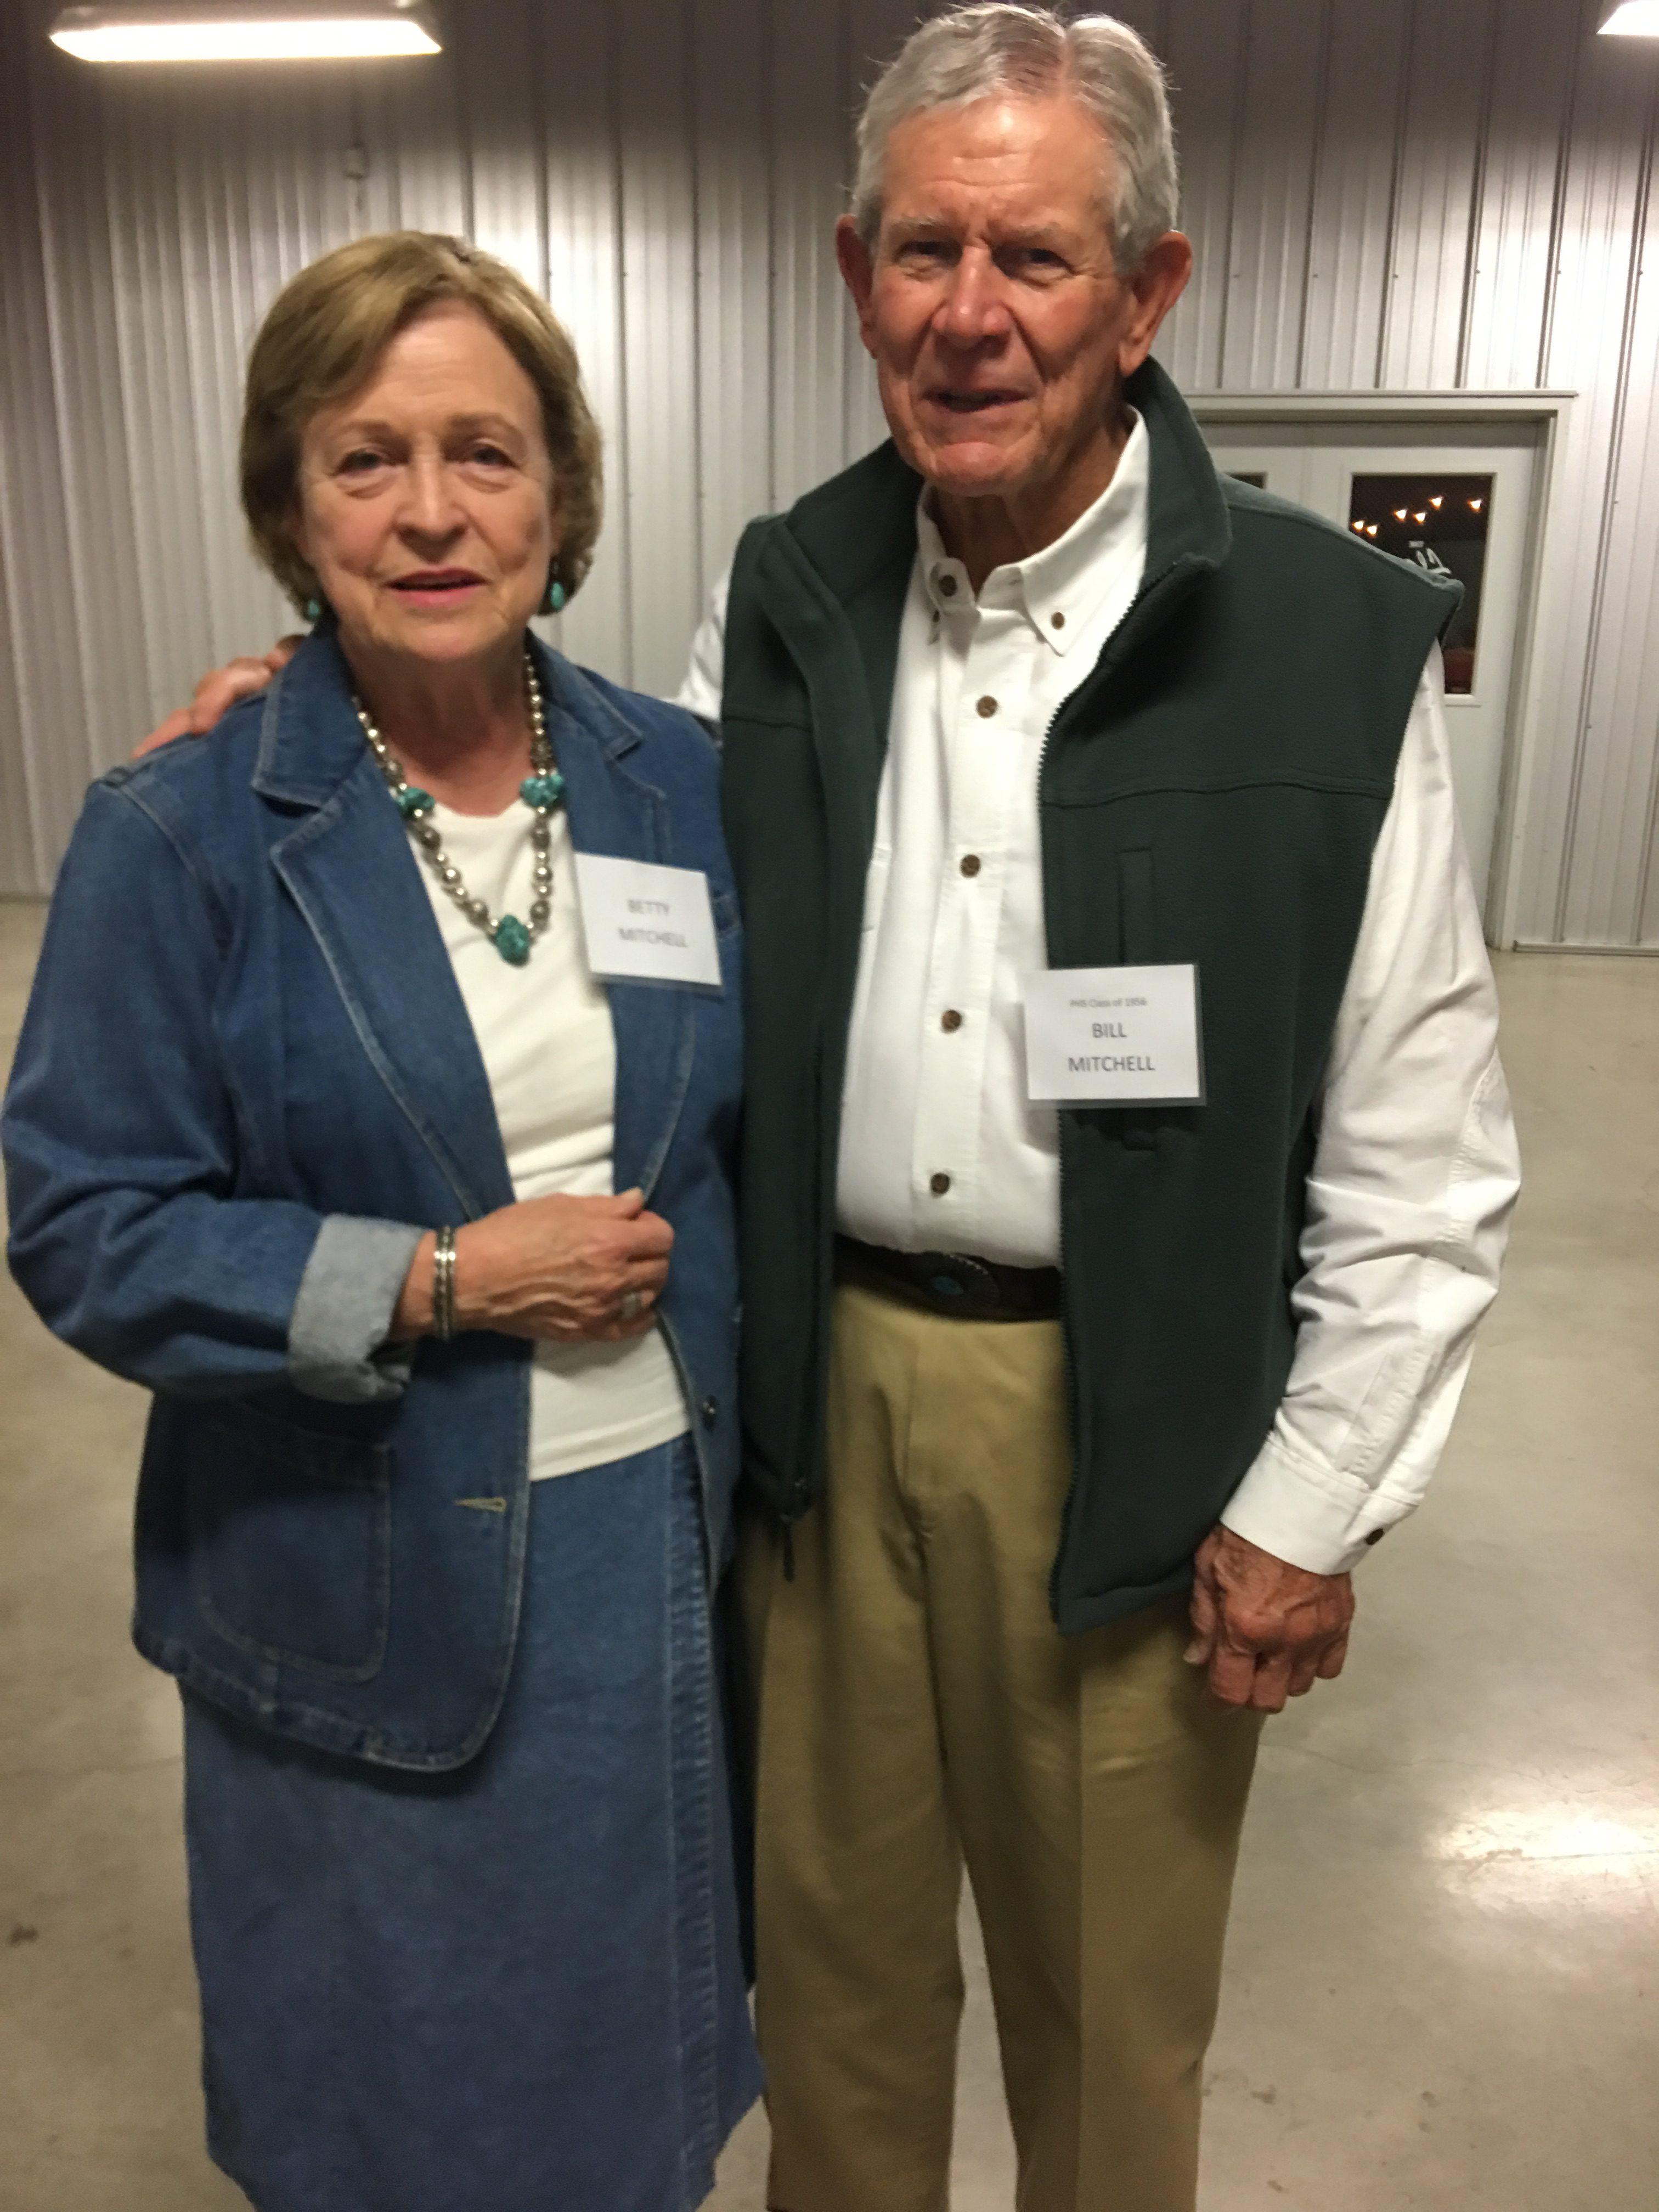 Betty and Bill Mitchell